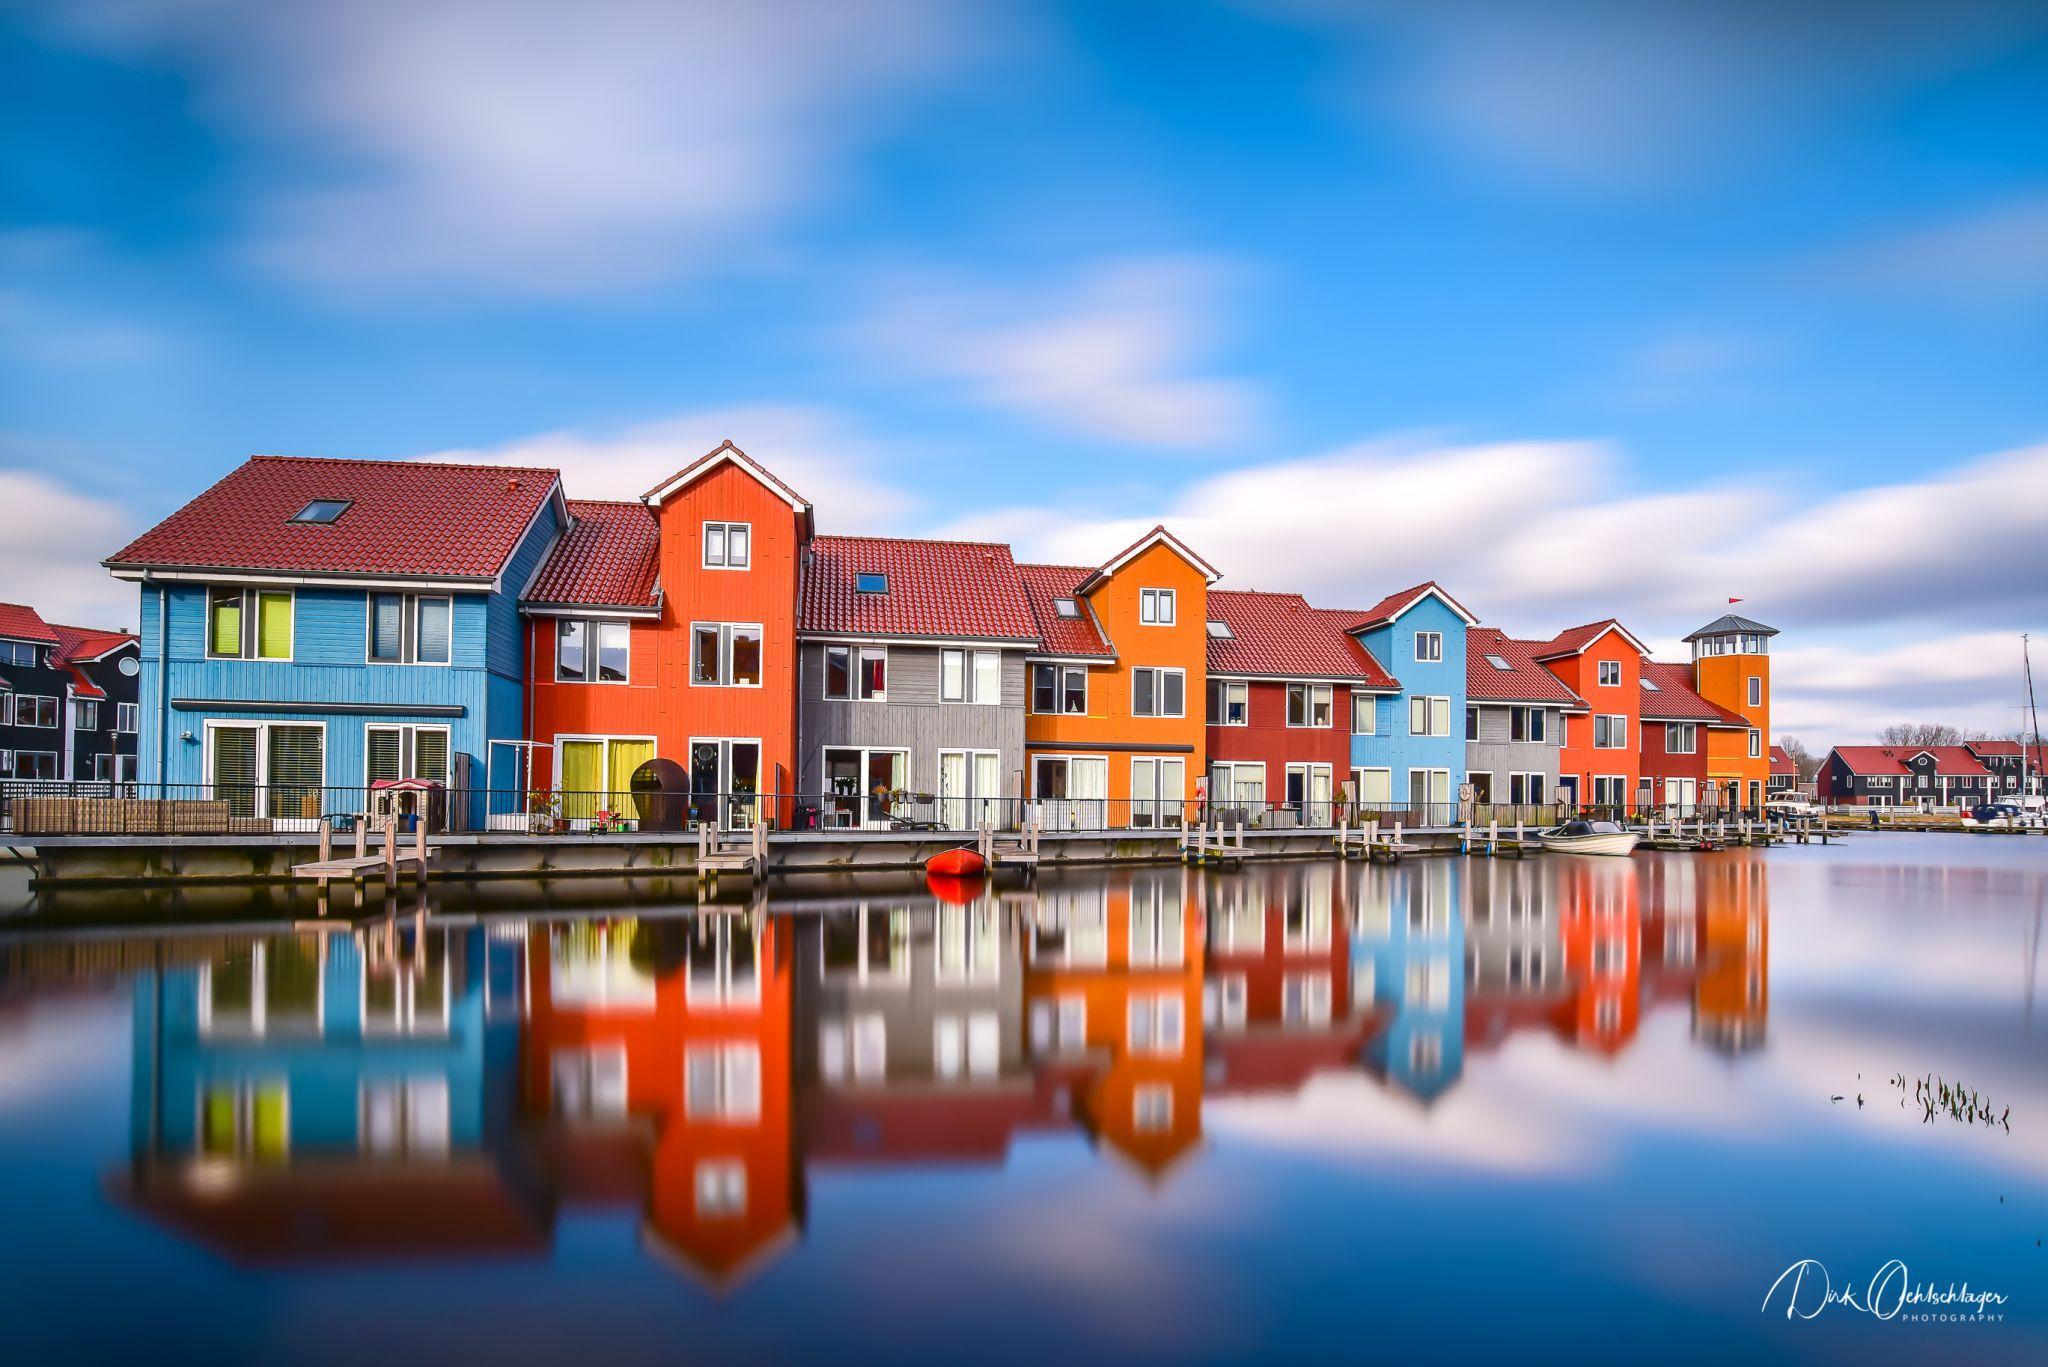 Reitdiephaven, Netherlands